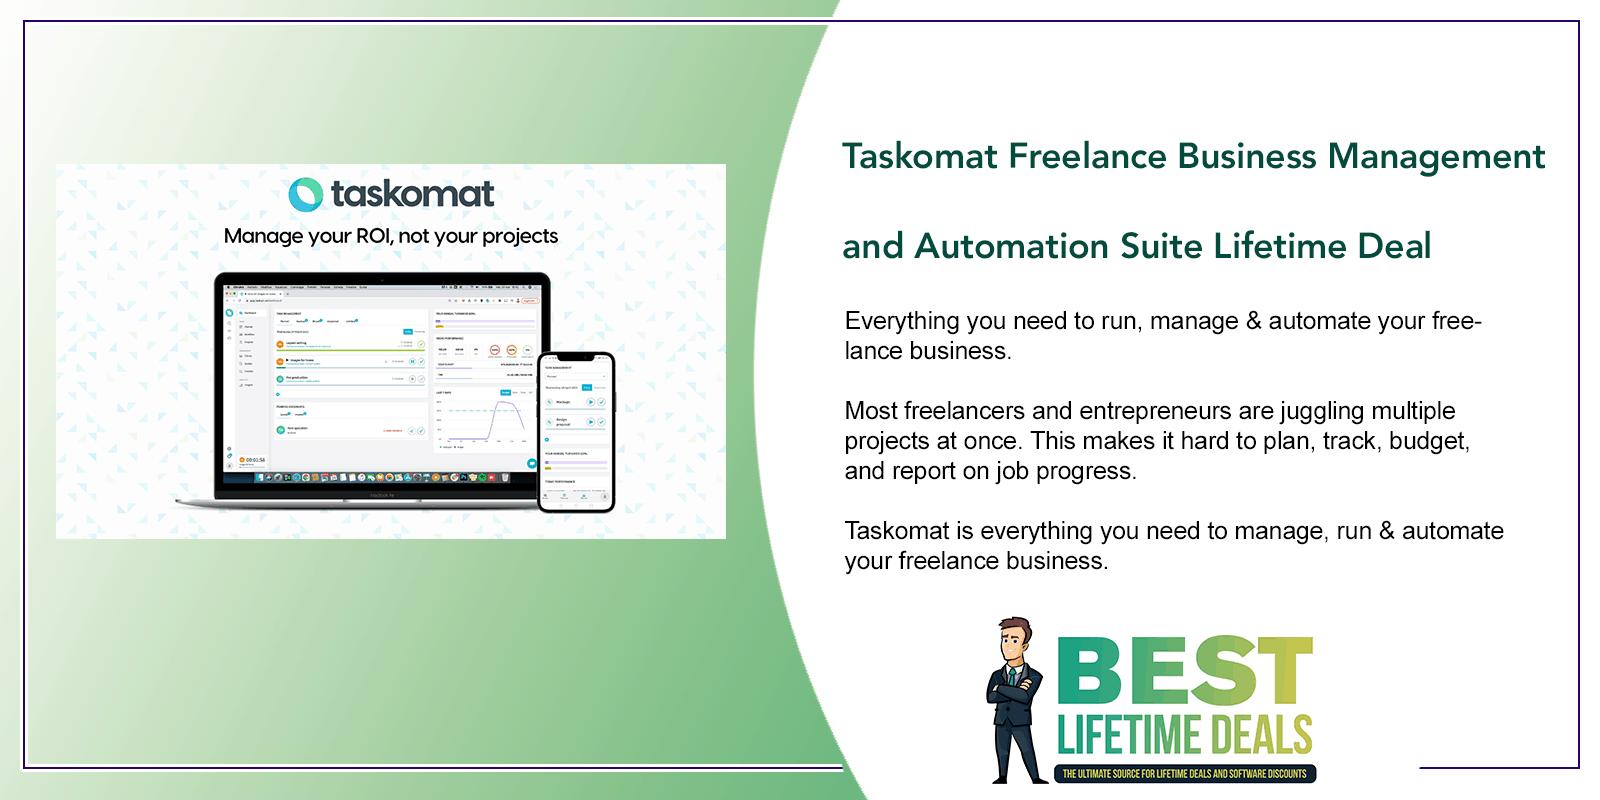 Taskomat Freelance Business Management Featured Image